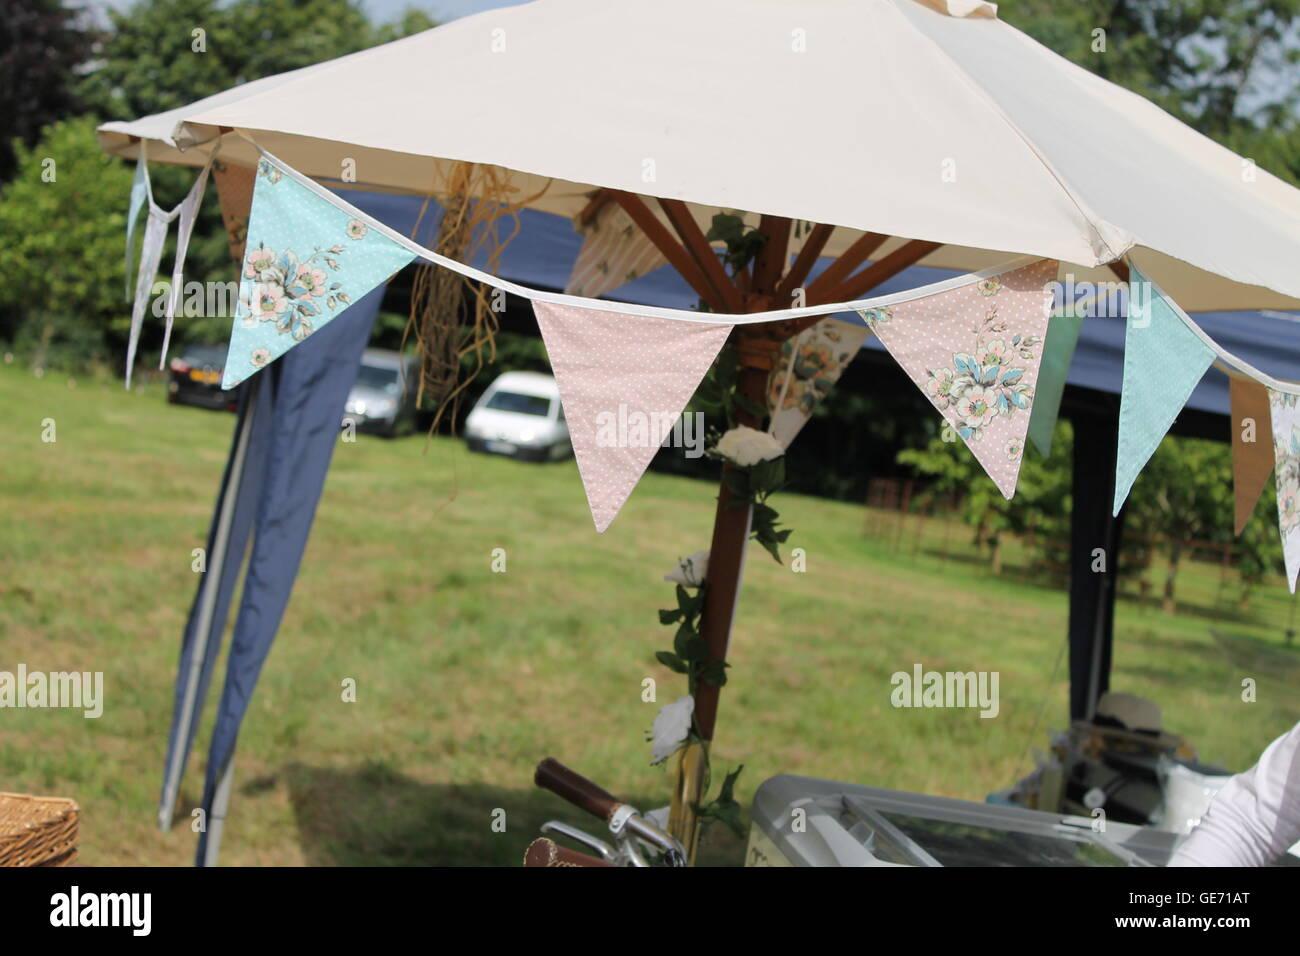 Ammer Sommer Hochzeit Party Camping Zelt Glamping Girlande